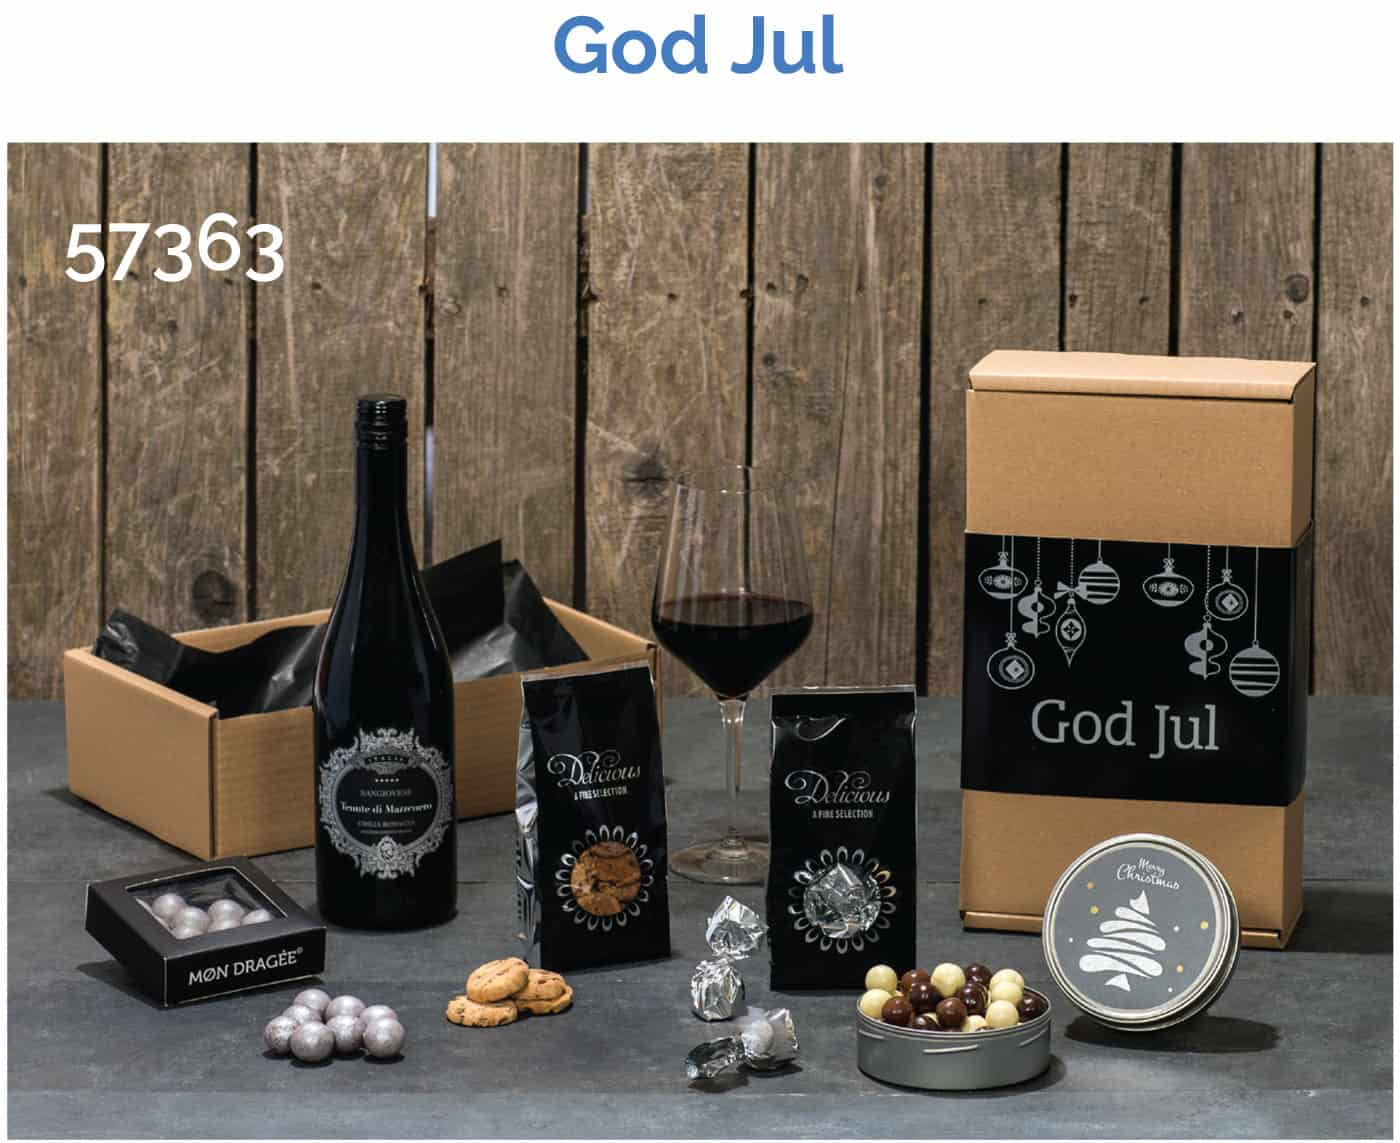 God jul - Basispakke - 57363